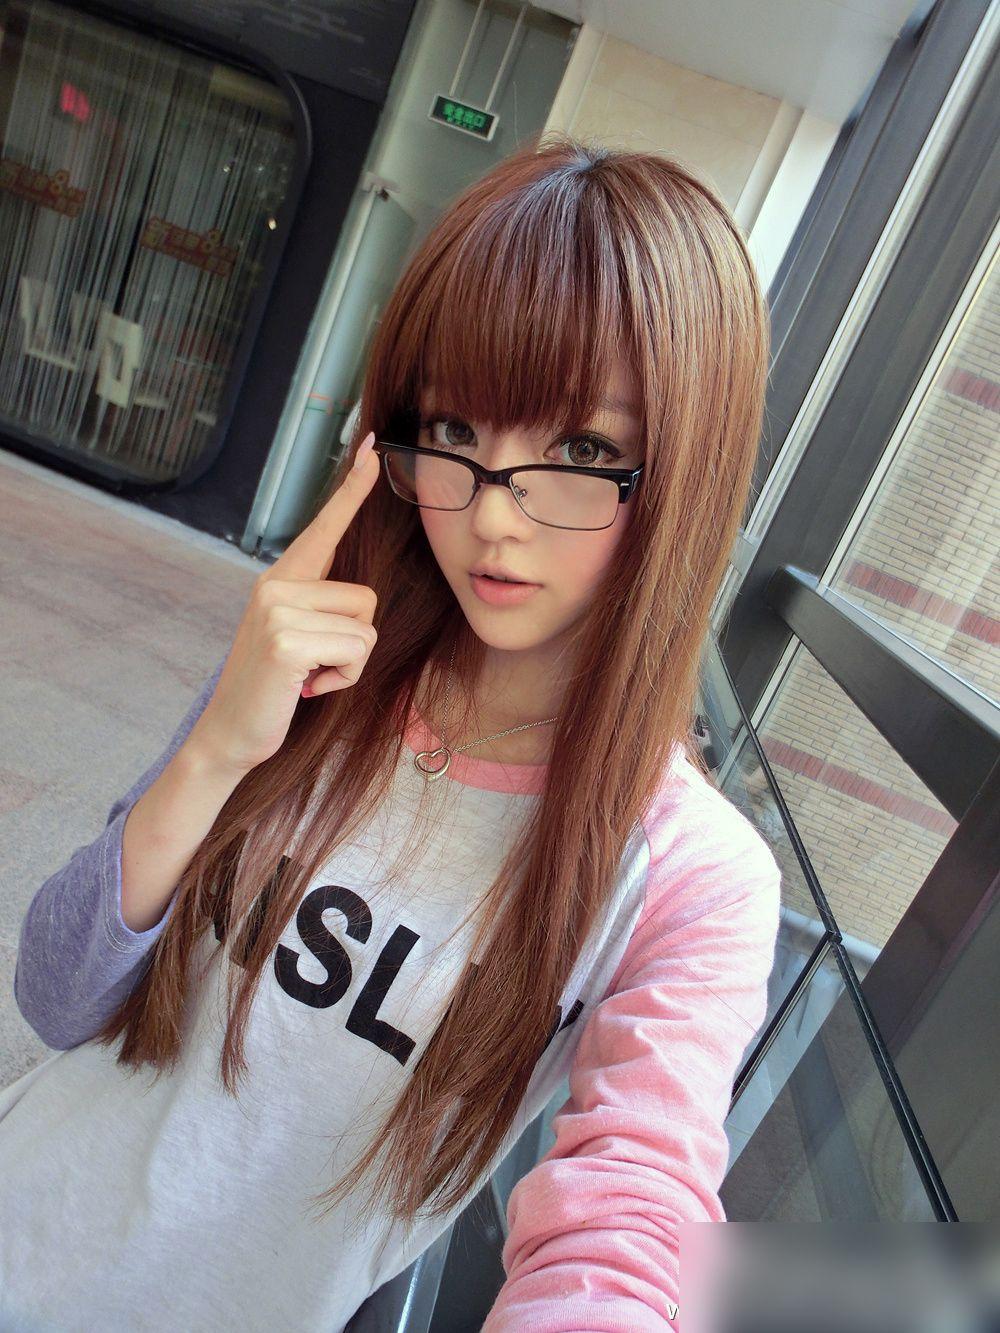 Girlswithglasses Chen Yue Kingboo Â�ジア風ヘアカット Ã�アスタイリング